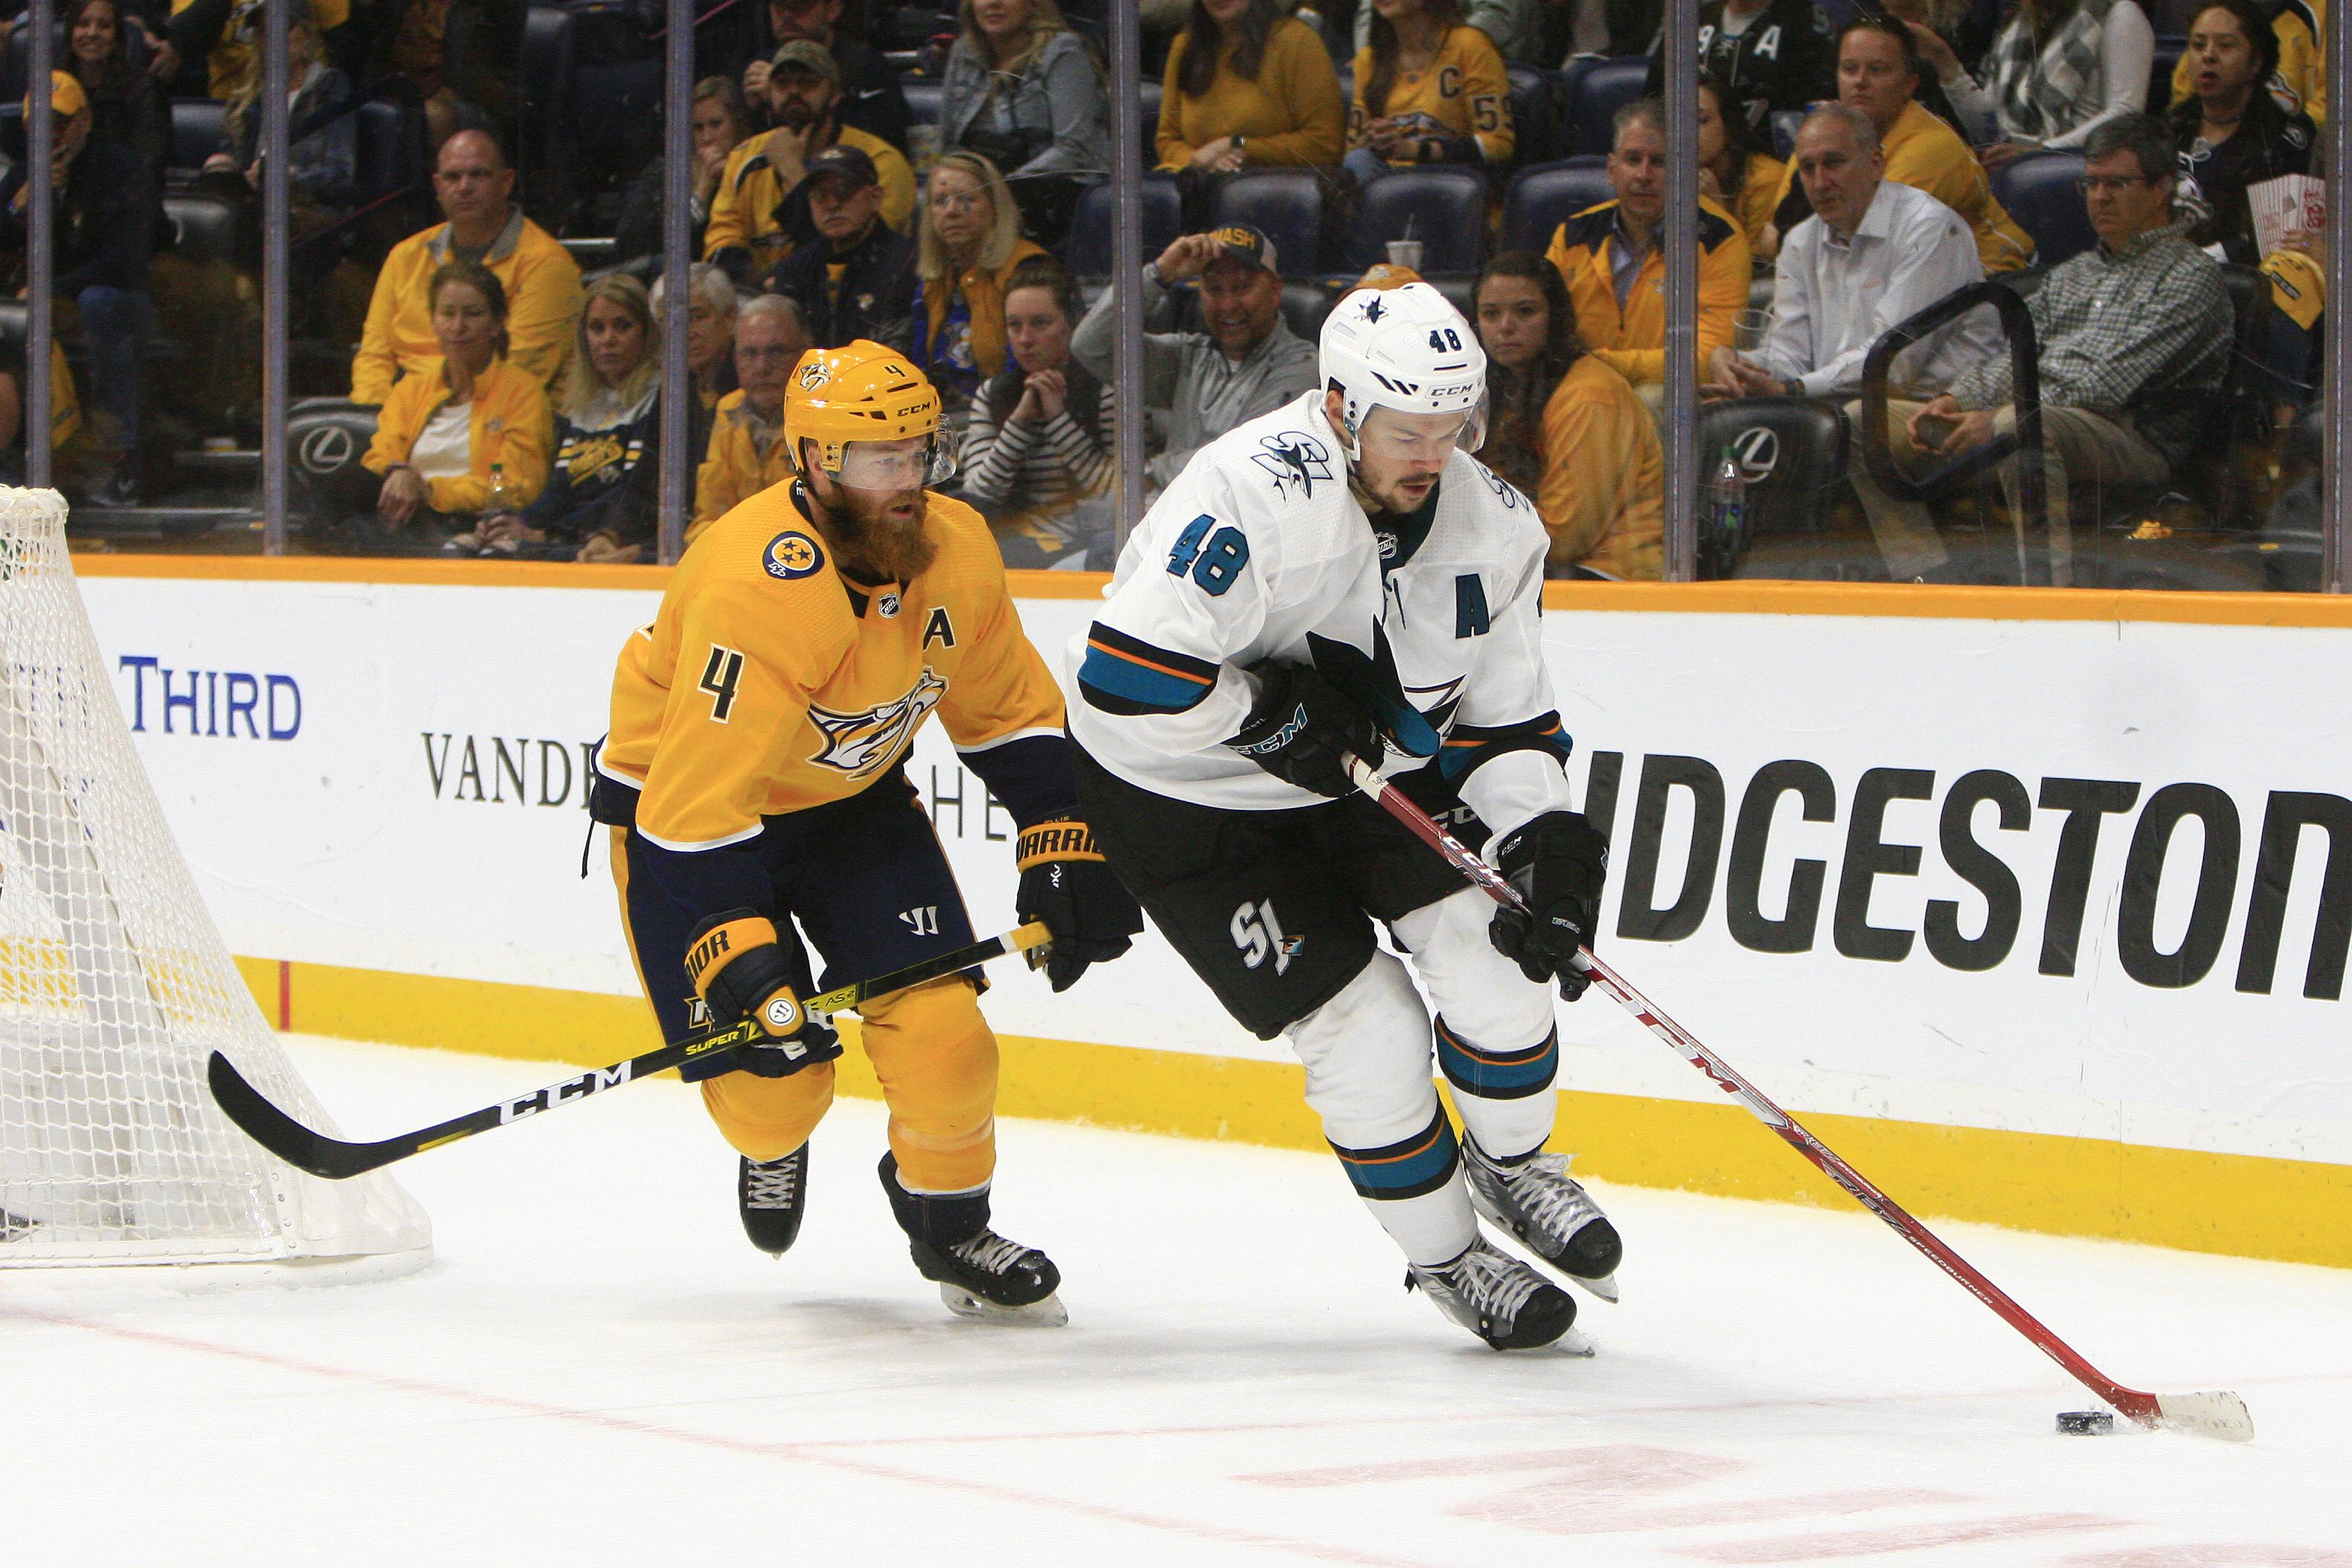 Nashville Predators defenseman Ryan Ellis (4) defends against San Jose Sharks center Tomas Hertl (48) during the NHL game between the Nashville Predators and San Jose Sharks, held on October 8, 2019, at Bridgestone Arena in Nashville, Tennessee.